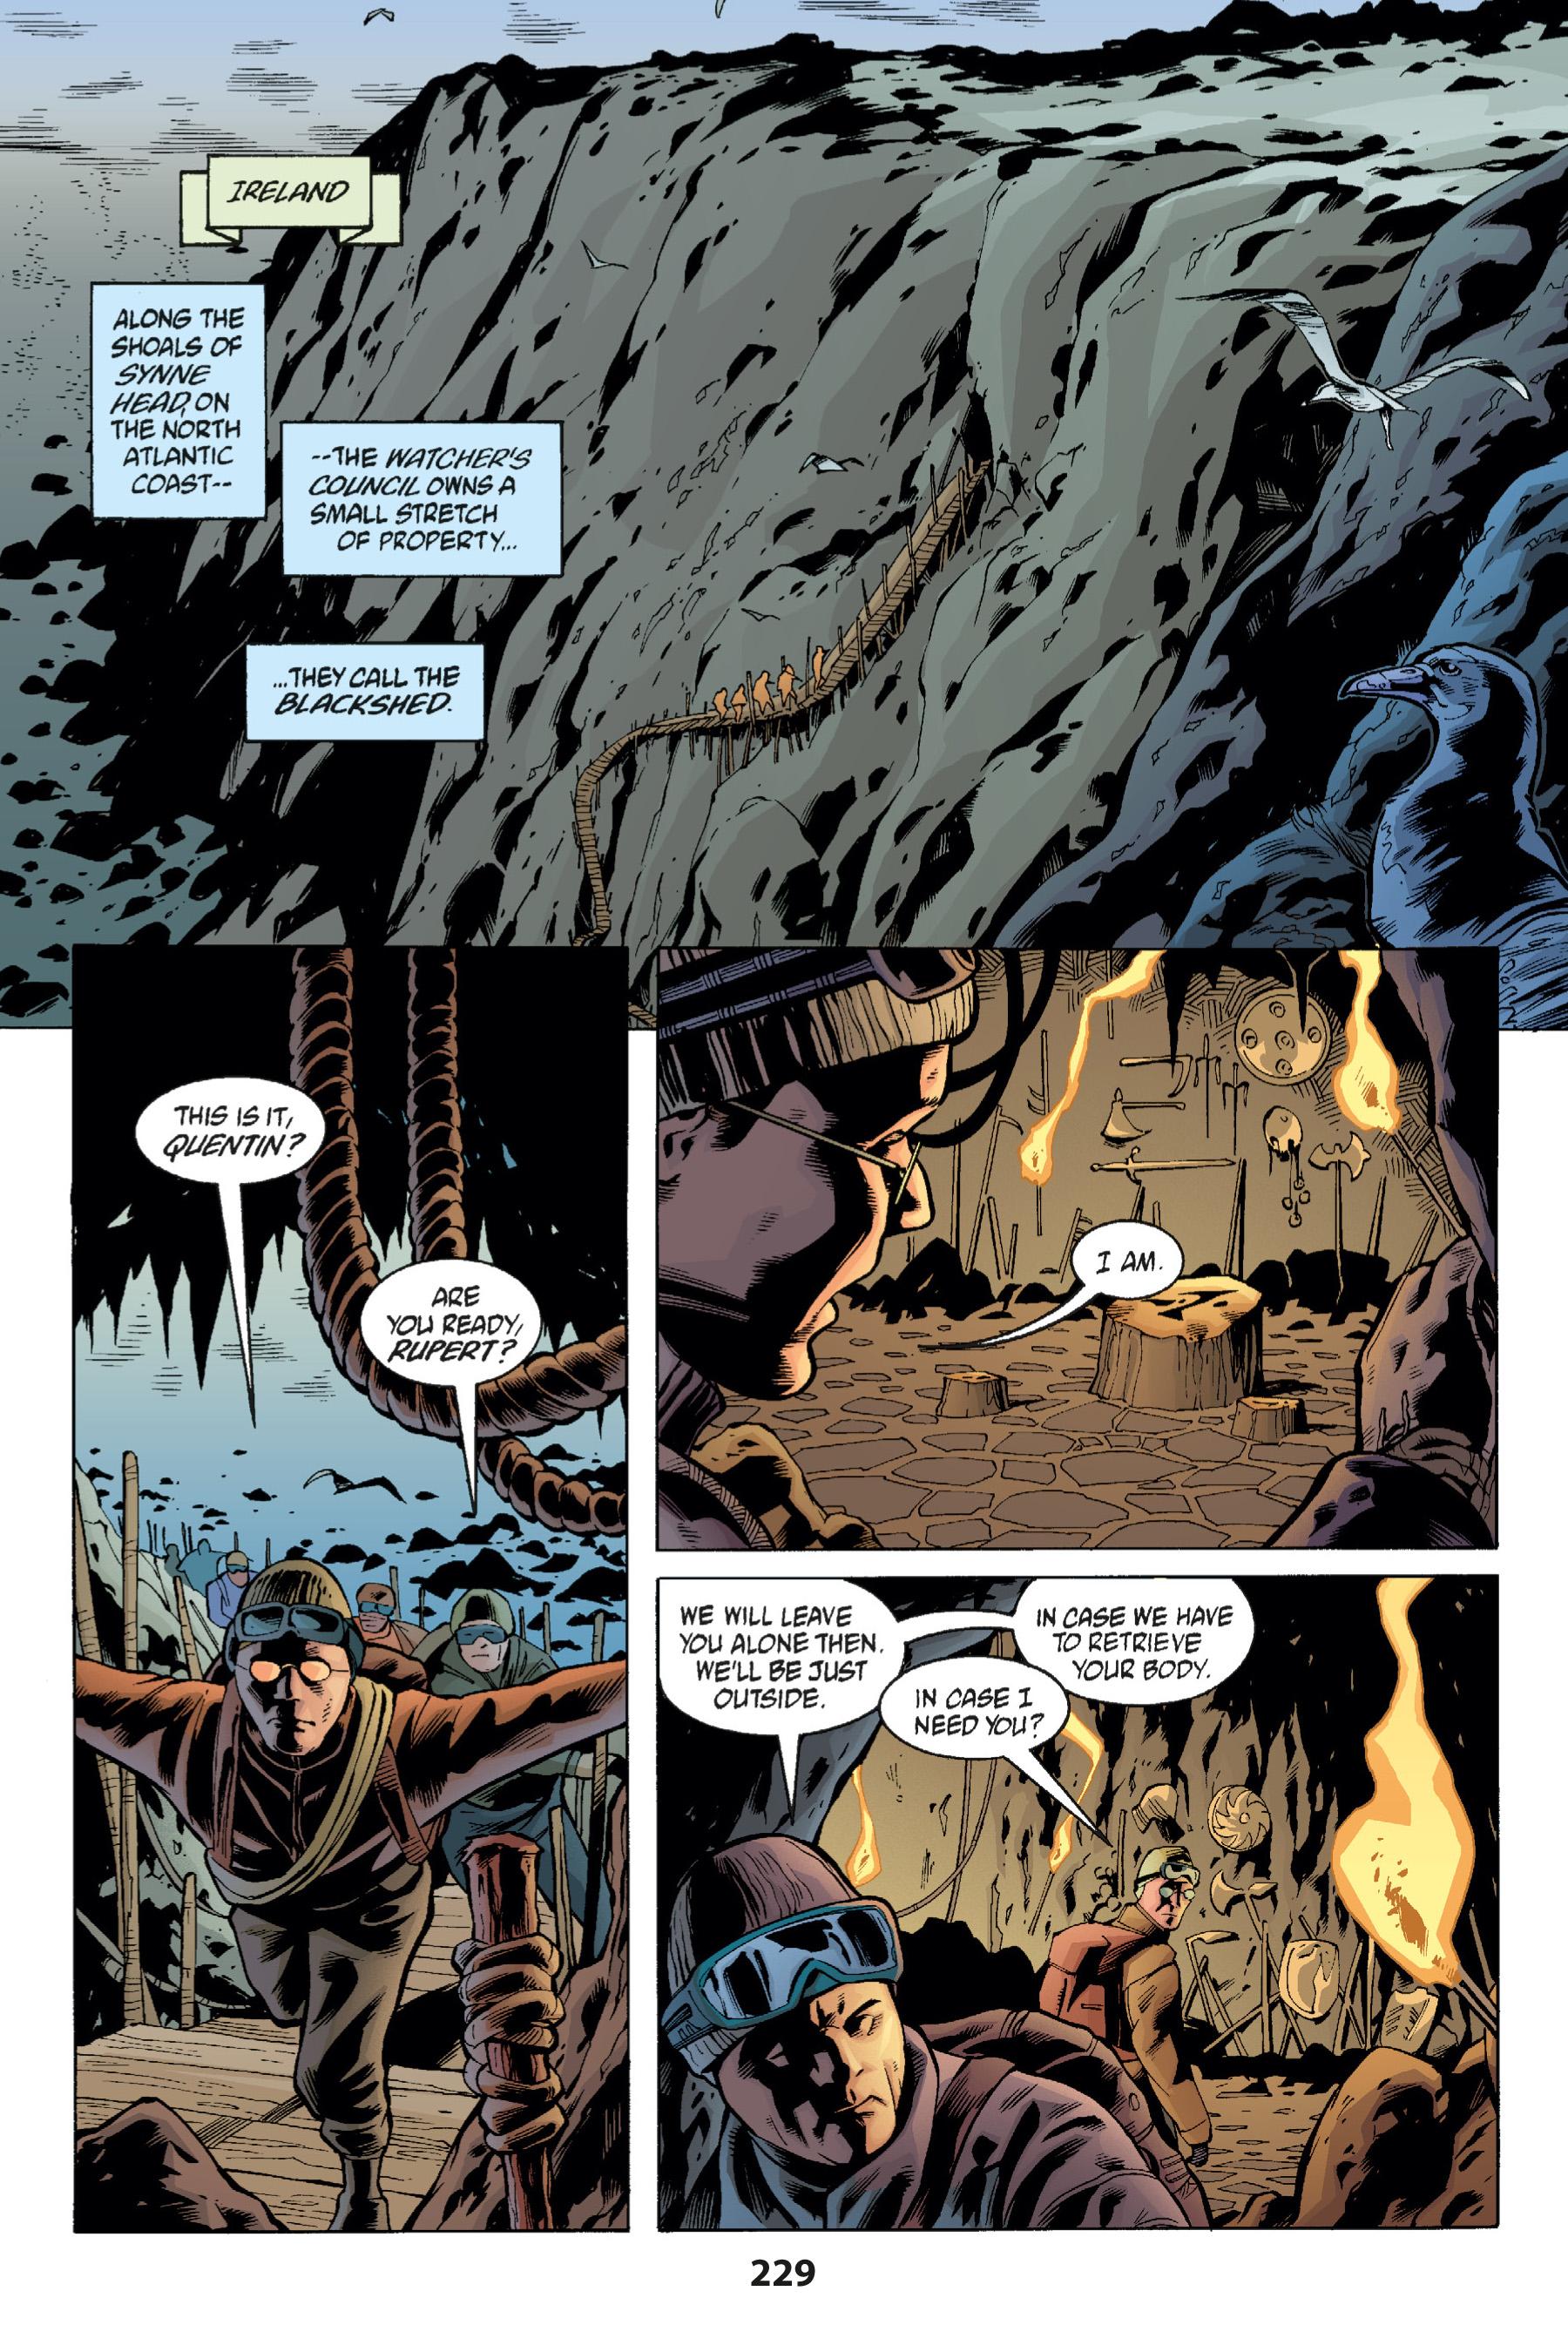 Read online Buffy the Vampire Slayer: Omnibus comic -  Issue # TPB 1 - 224